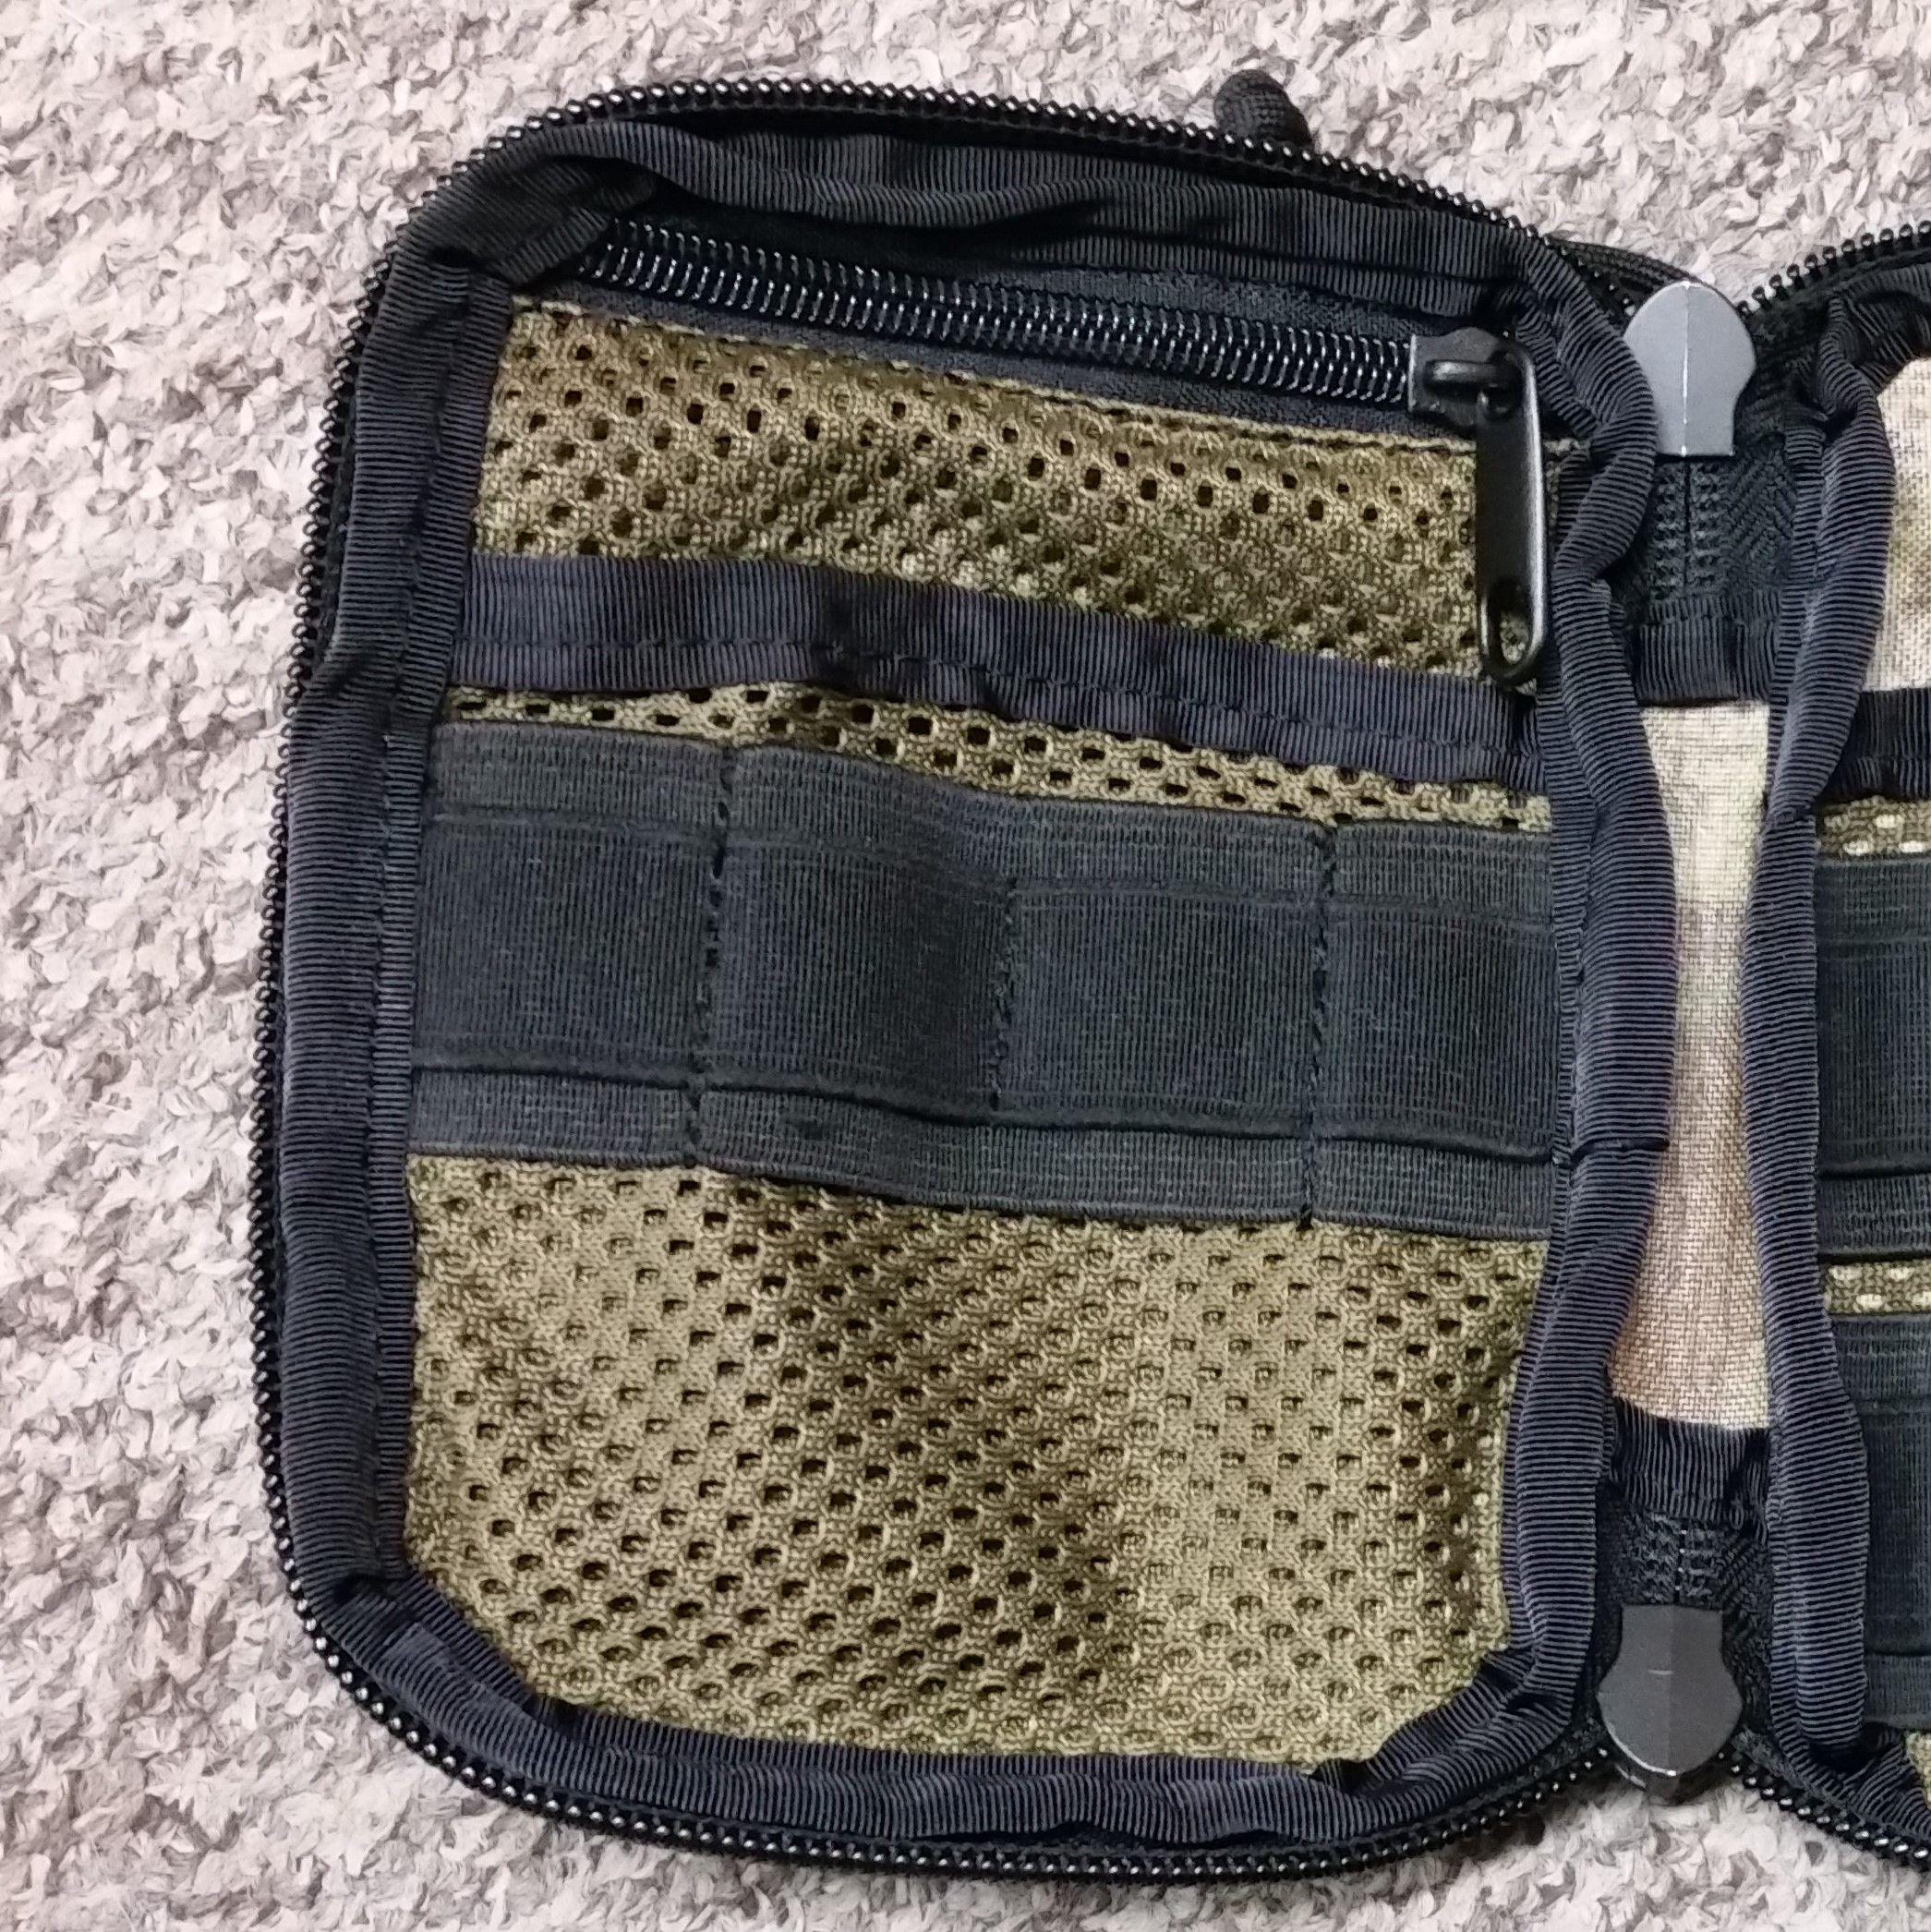 Pocket with zipper closure under flat, mesh pocket +9pln